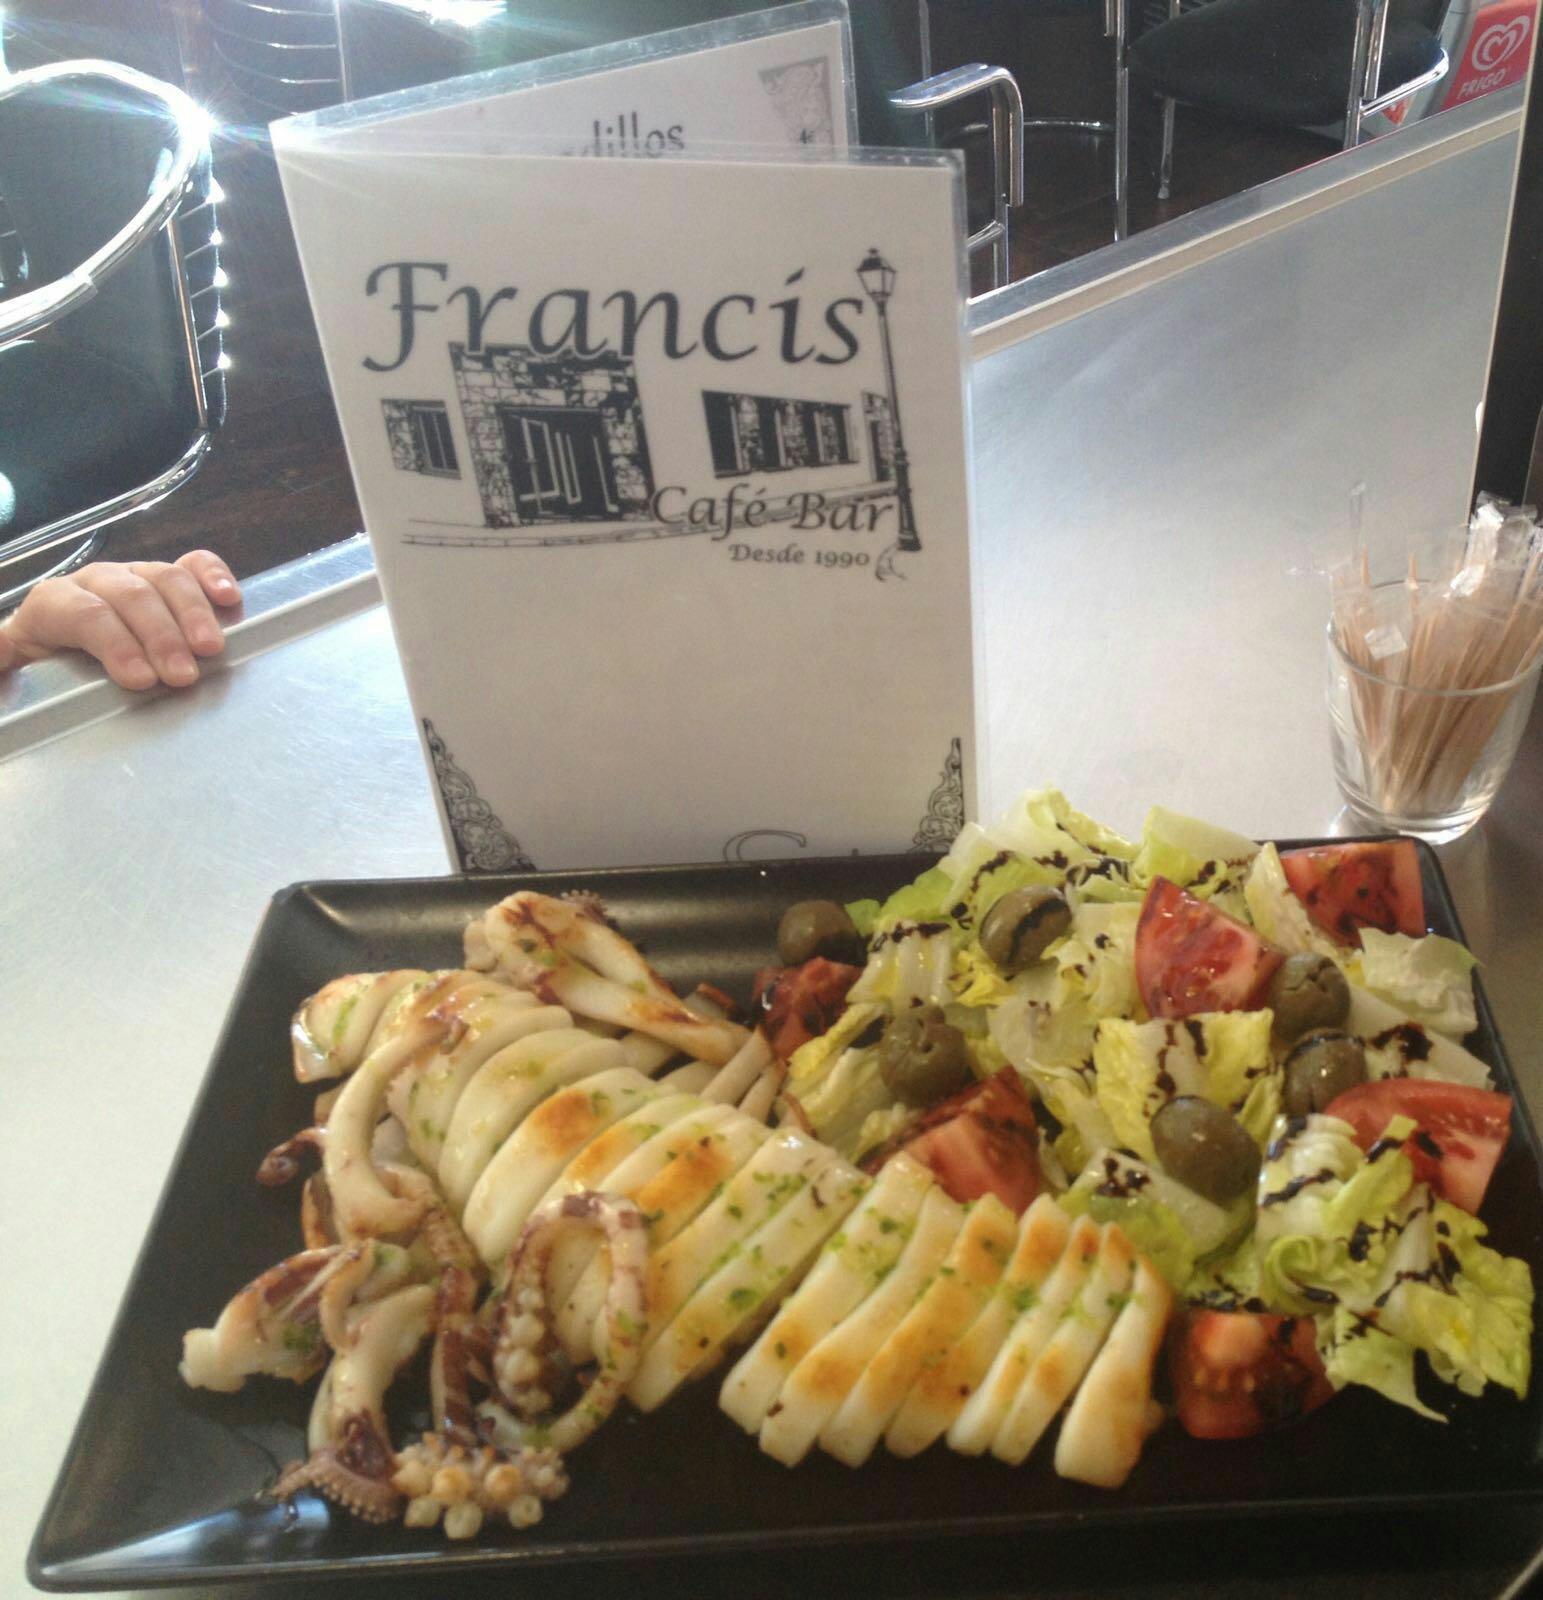 Cafe Bar Francis